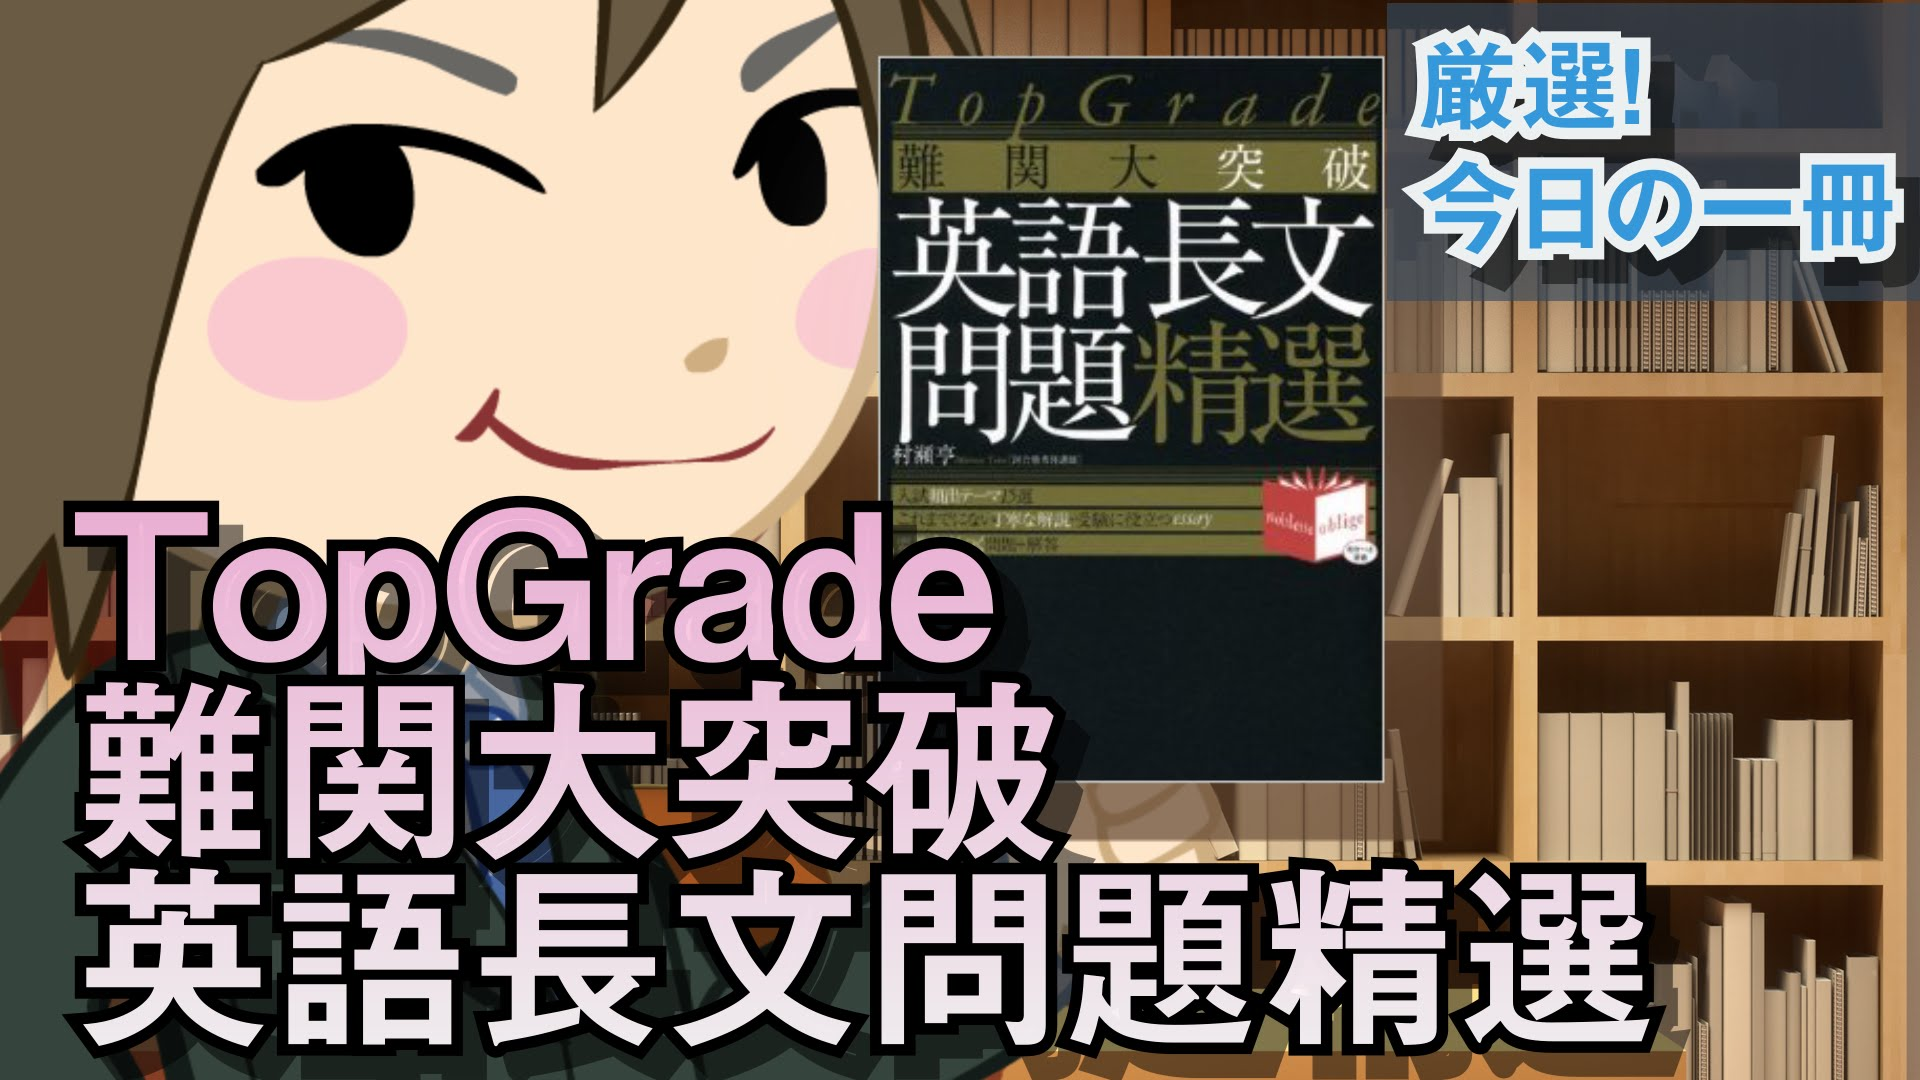 TopGrade 難関大突破 英語長文問題精選|武田塾厳選!今日の一冊